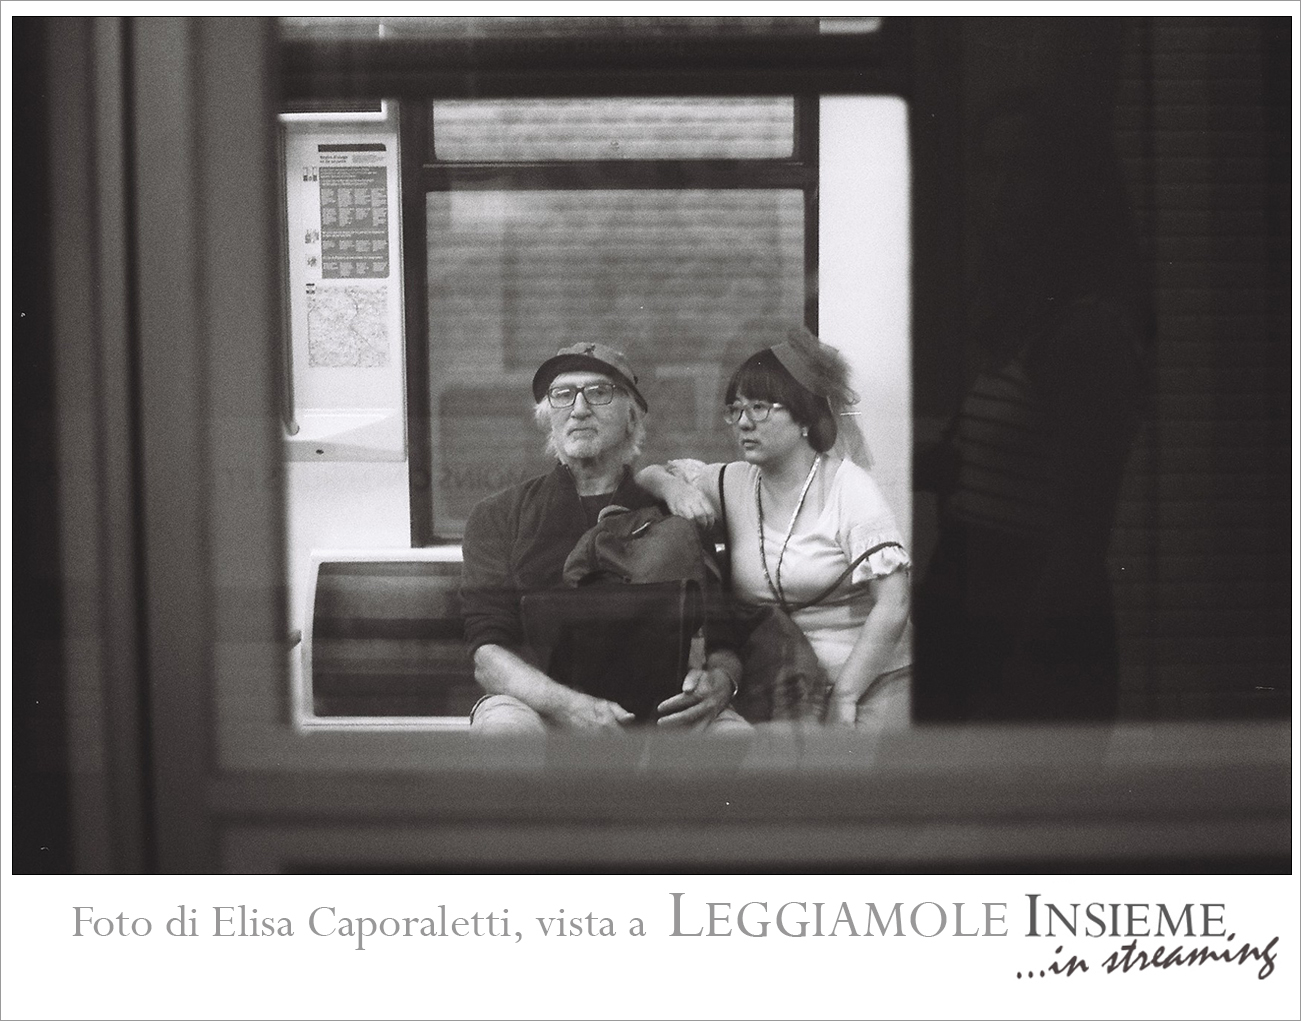 Elisa Caporaletti